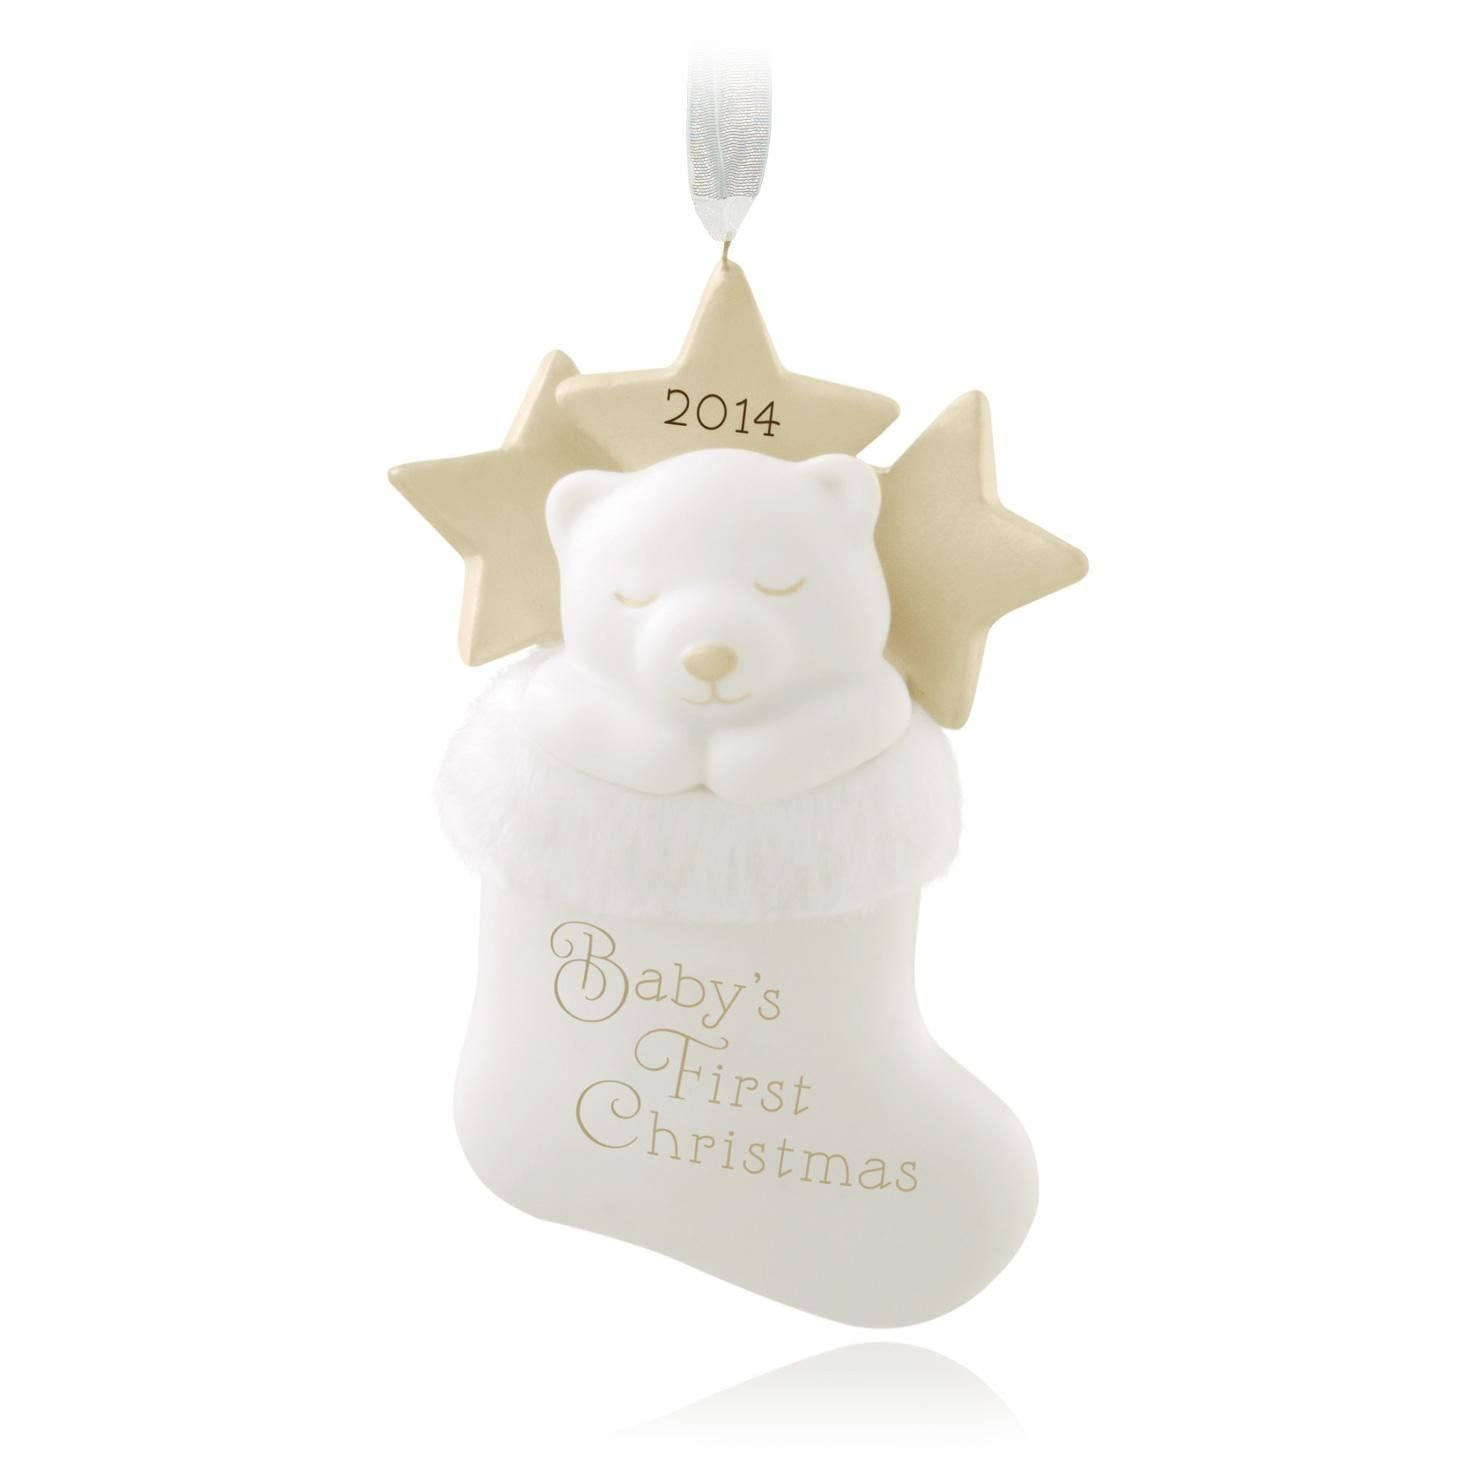 Amazon: Hallmark 2014 Baby's First Christmas Stocking Holiday Keepsake  Ornament: Home & Kitchen